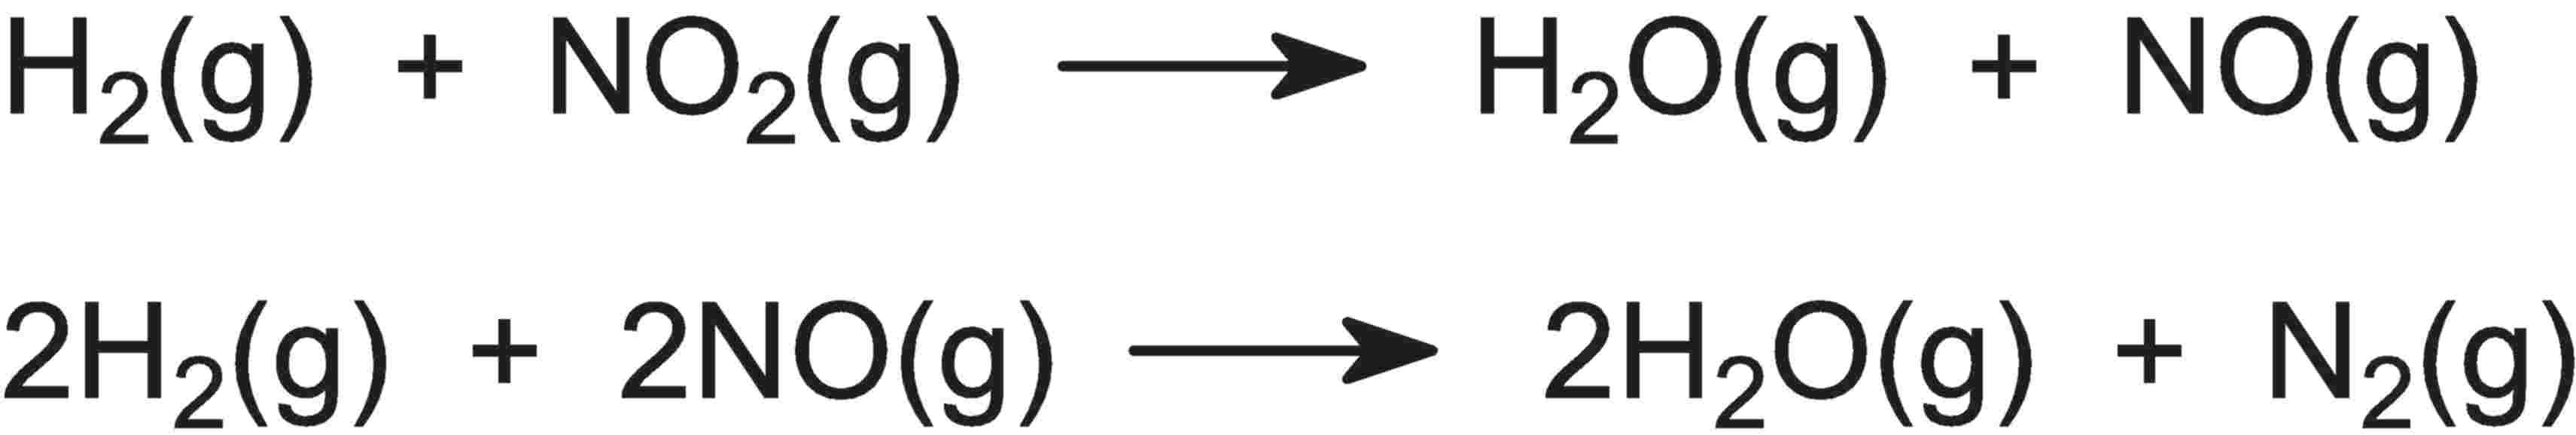 Nitric acid b absorption of the nitrogen oxides buycottarizona